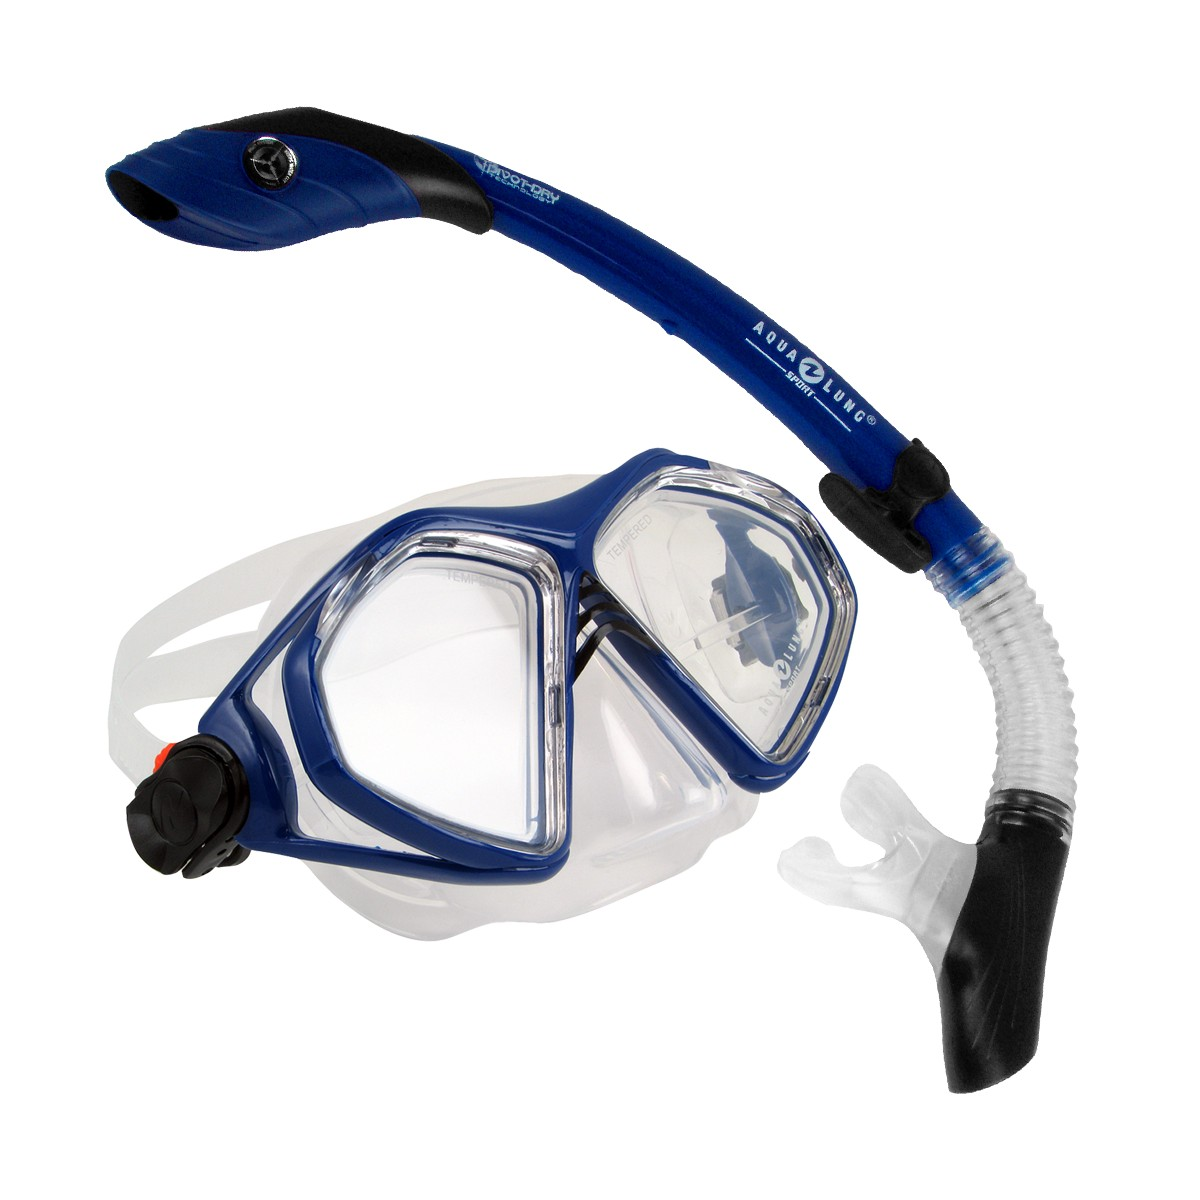 Aqua Lung Admiral 2 LX, Island Dry LC Combo Dive Mask & Snorkel